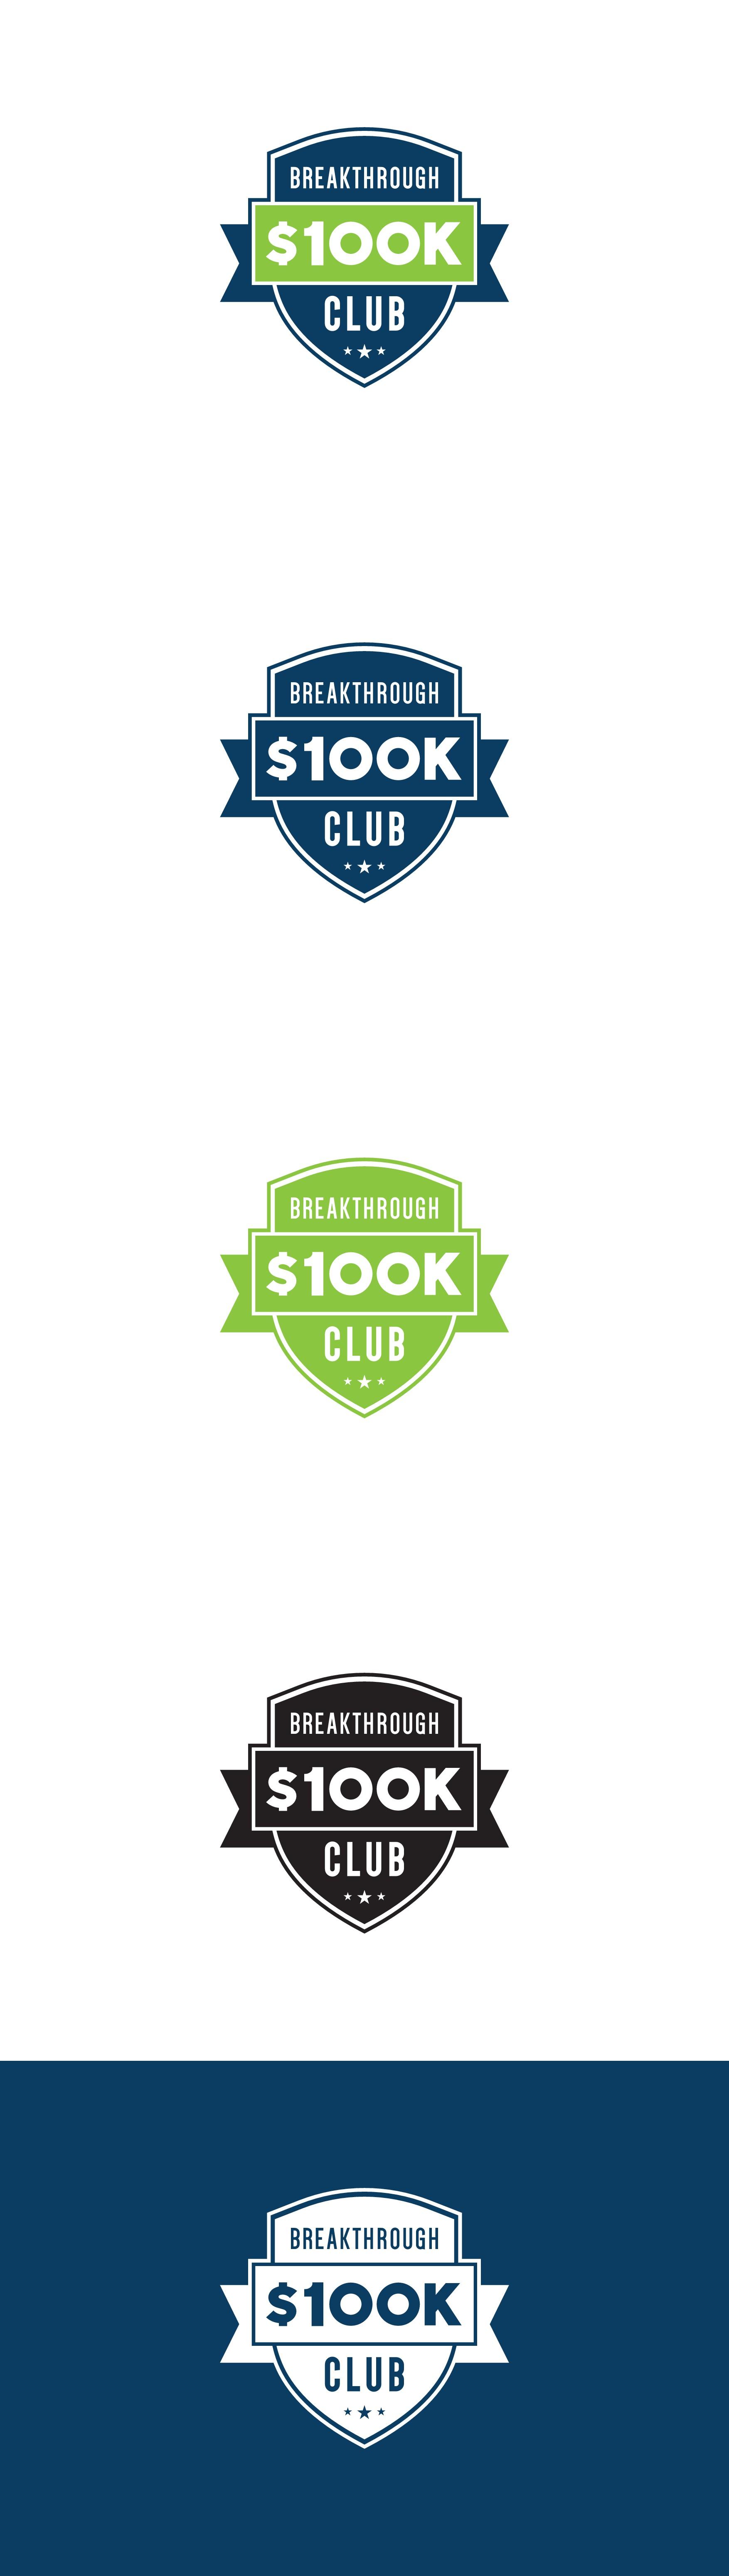 Breakthrough 100k Club Logo Design